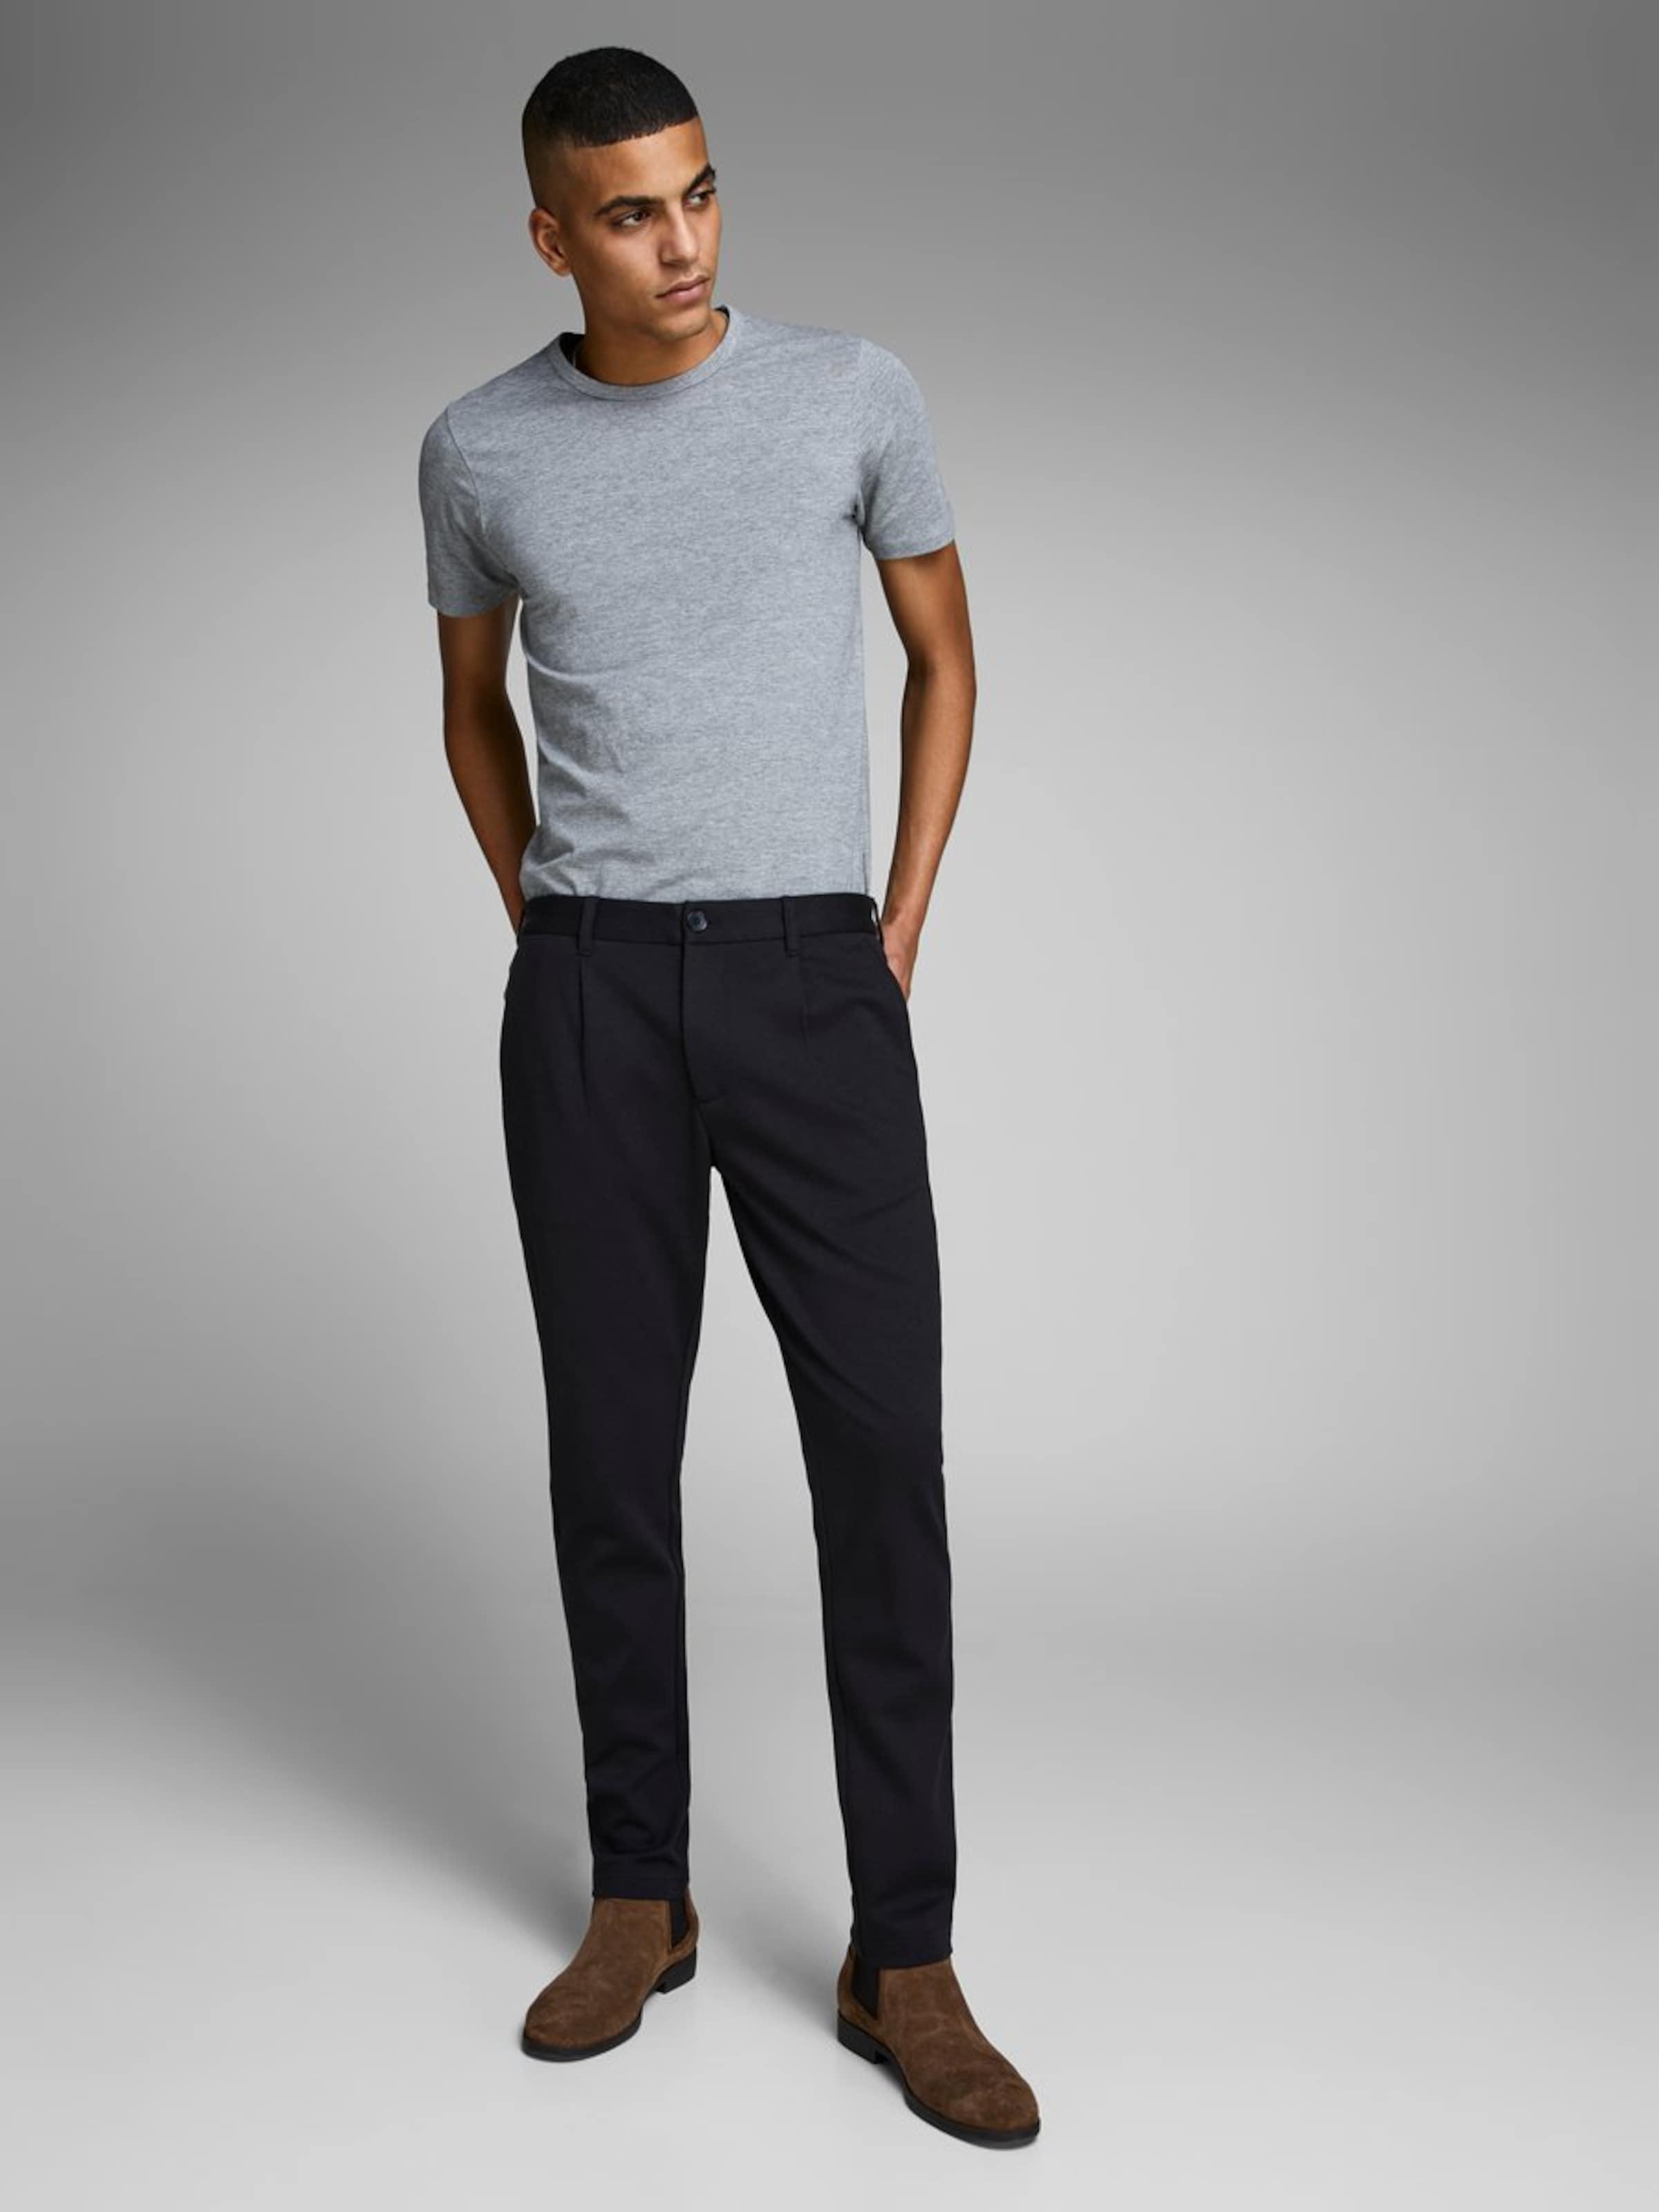 Jones Jackamp; À En Pantalon Noir Pince fgmYI6yvb7